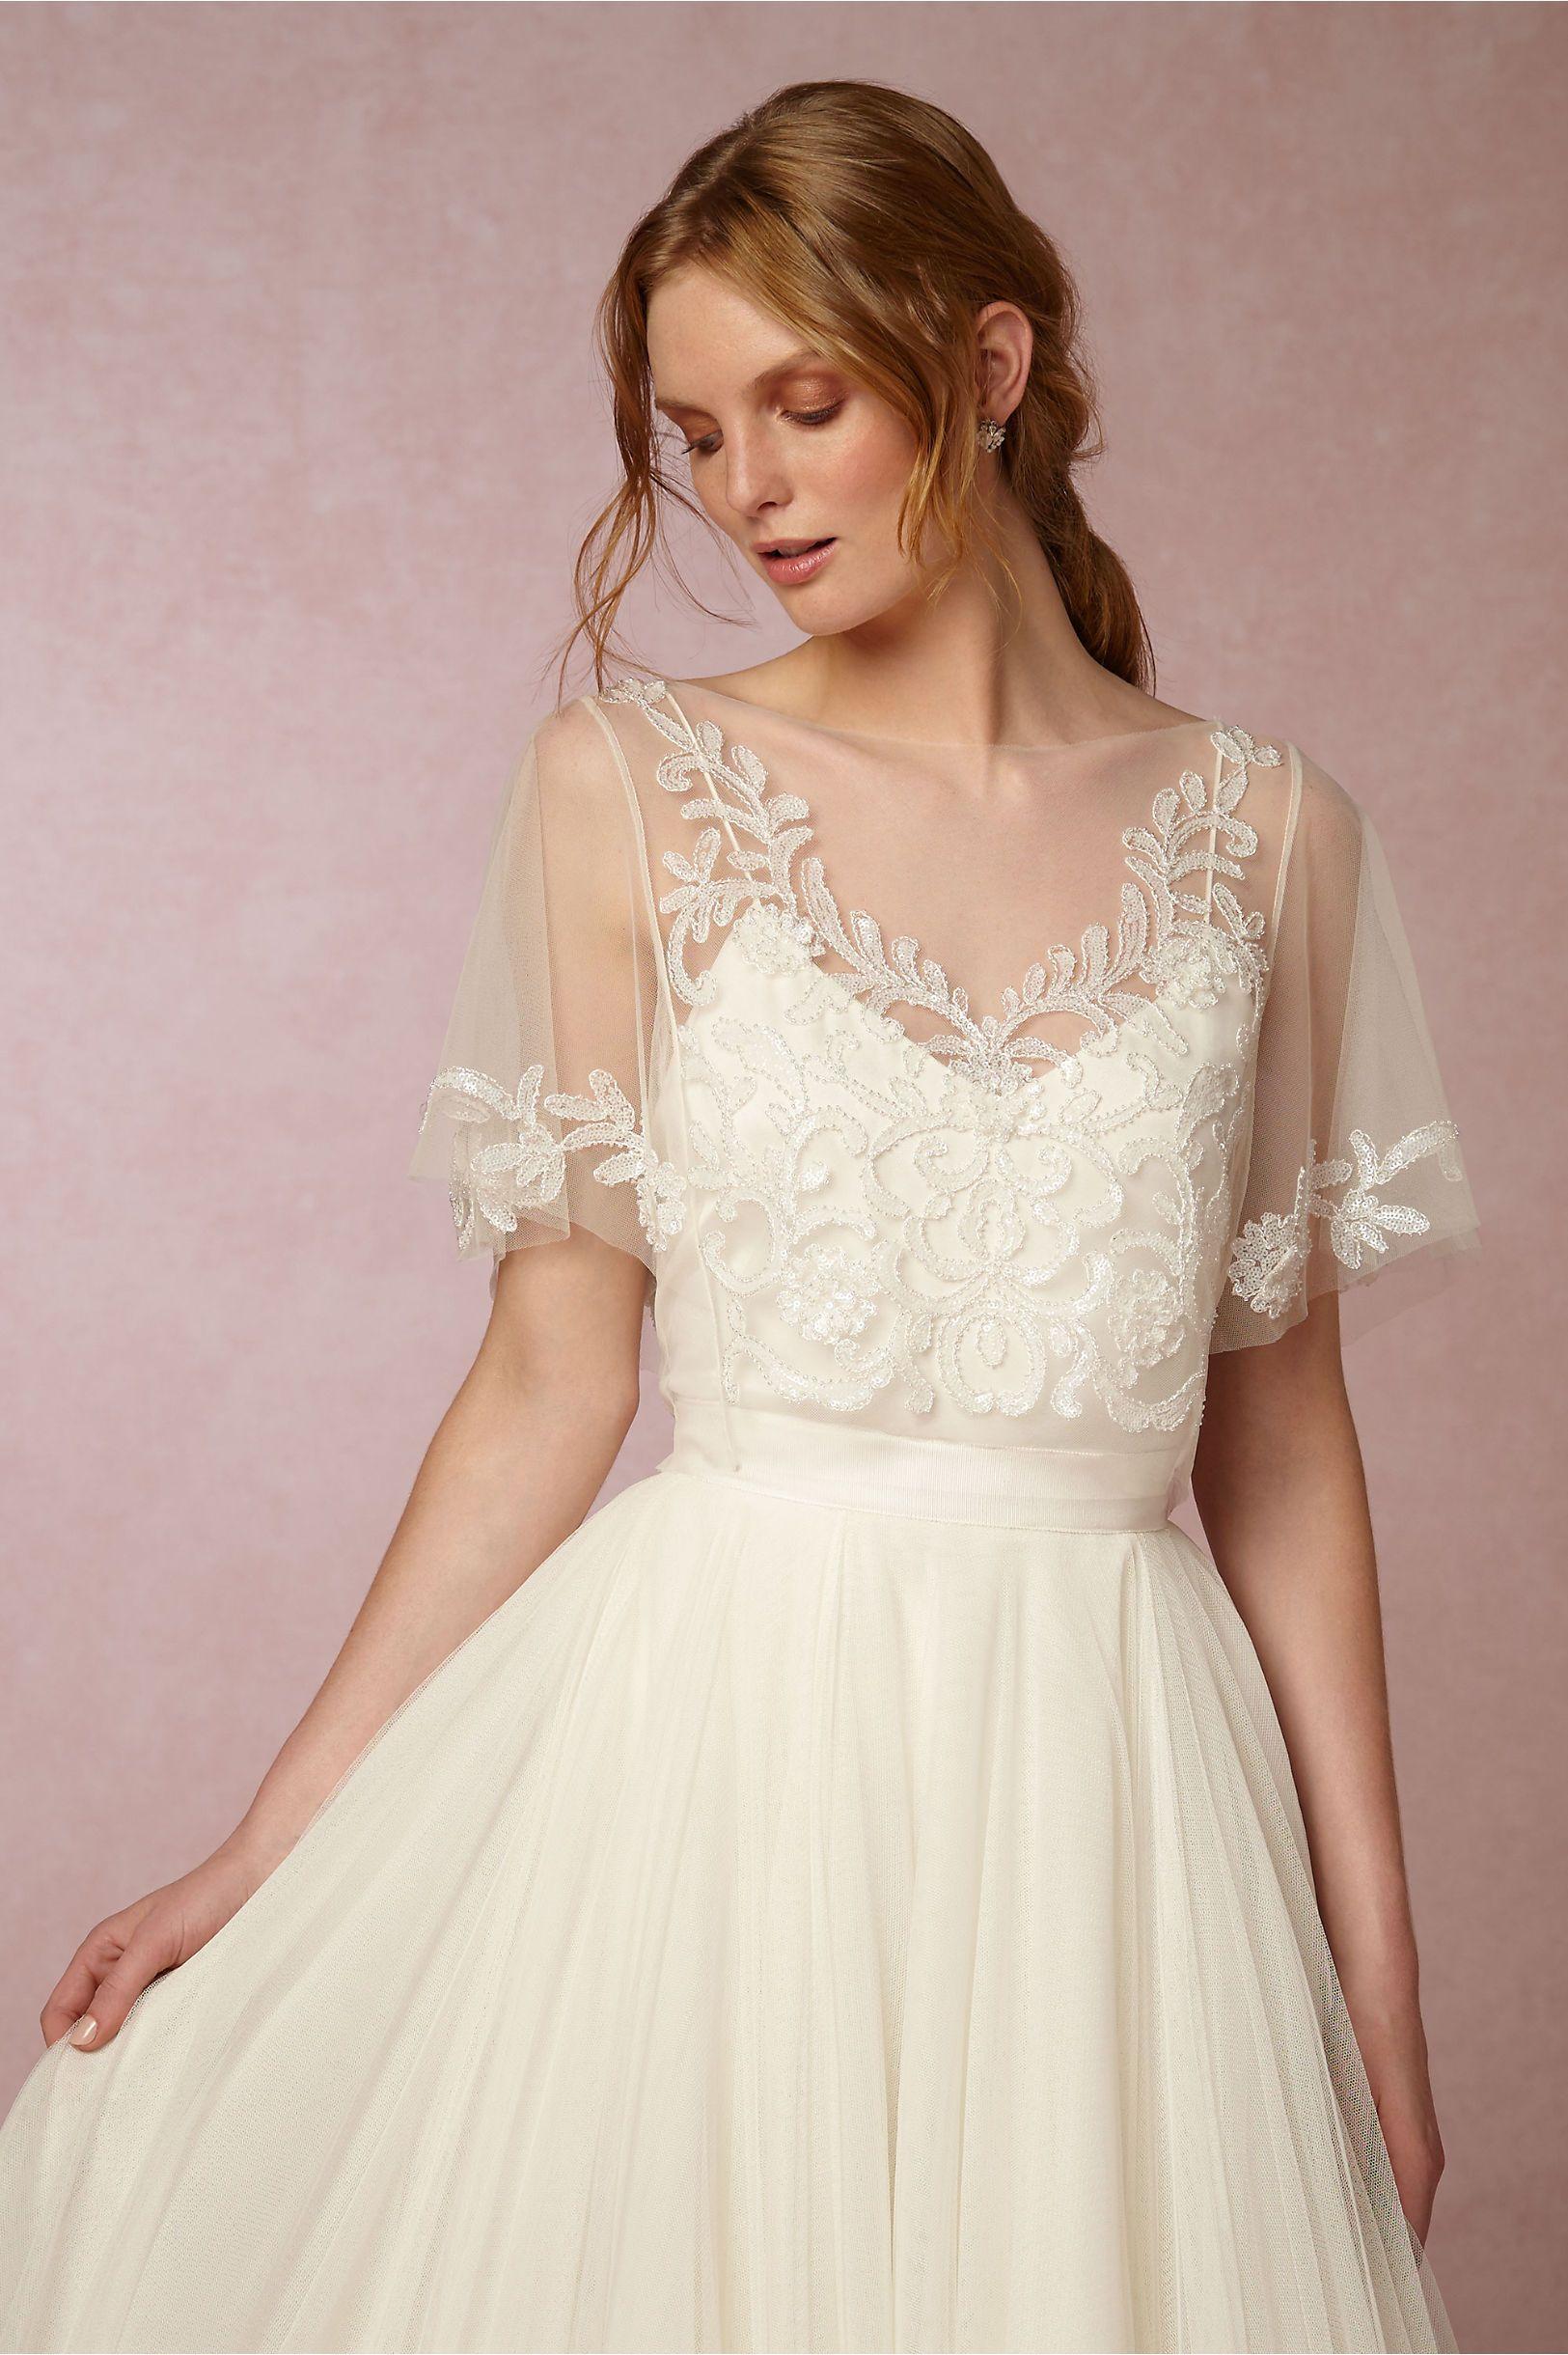 Wedding Gown Topper Silk Bhldn Marisol Topper In Bride Bridal Separates Bhldn Wedding Dress Topper Two Piece Wedding Dress Wedding Dress Trends [ 2440 x 1625 Pixel ]